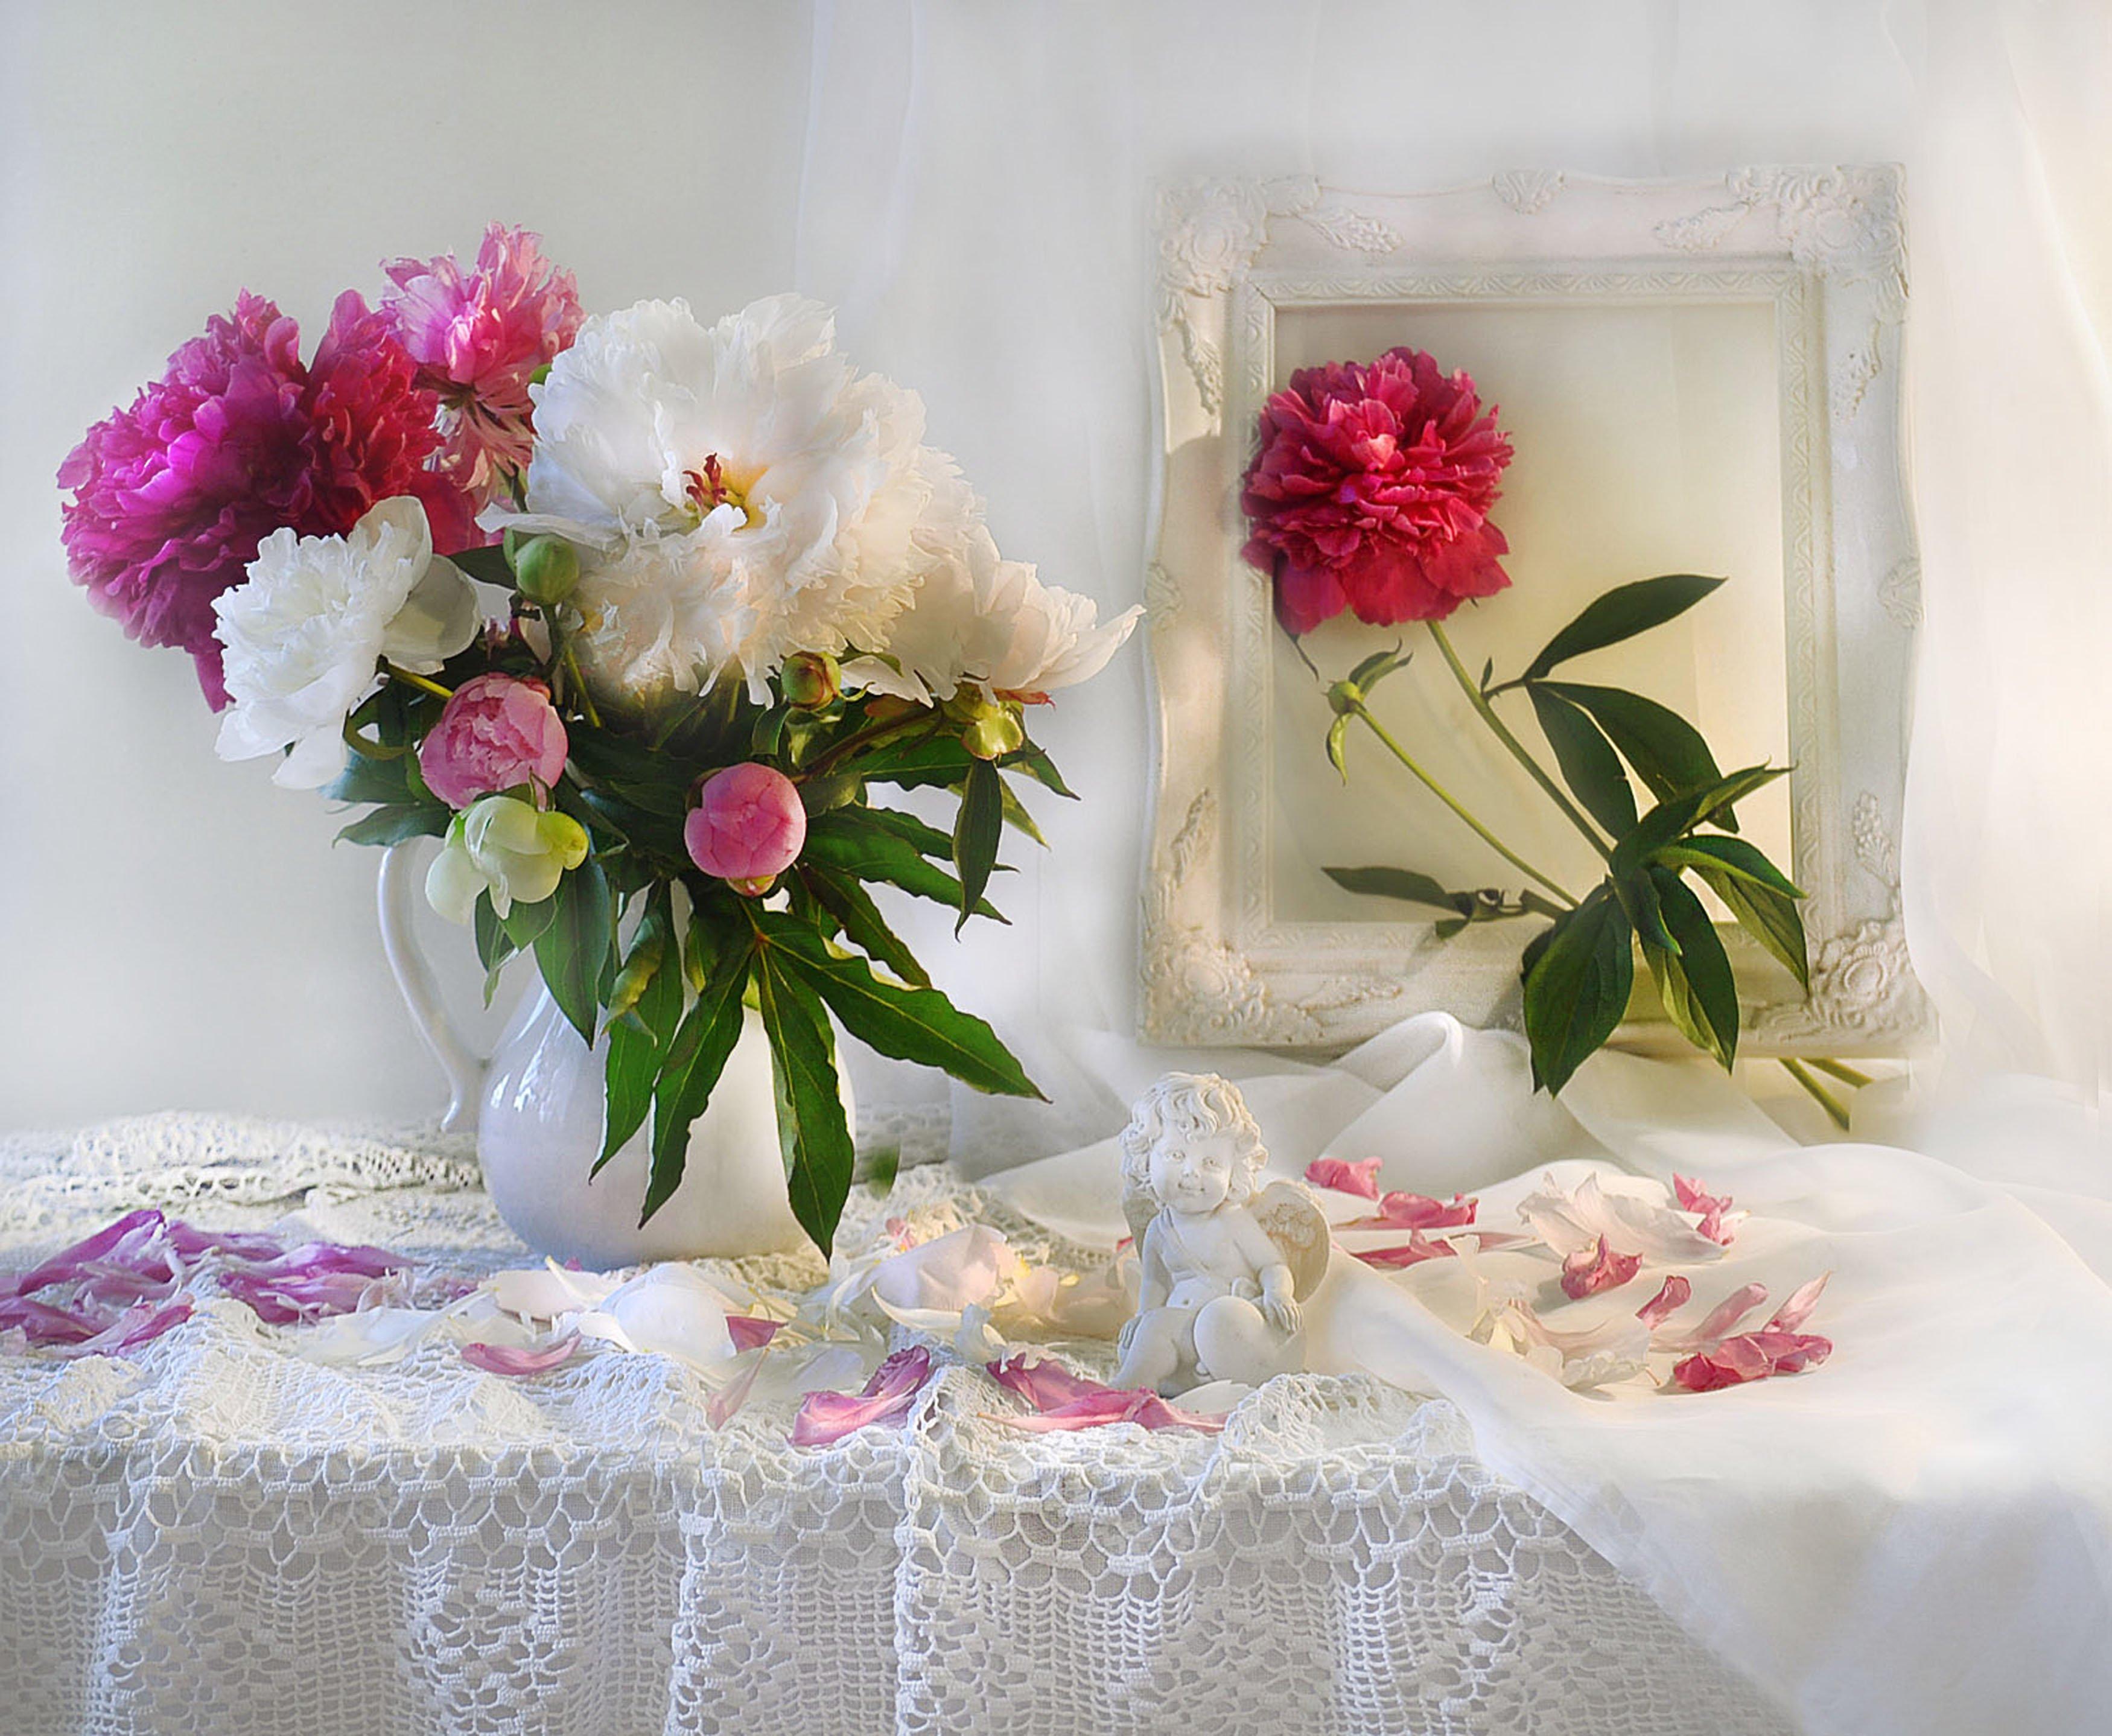 still life, натюрморт, ангел, летние грёзы, пионы, фото натюрморт, цветы, Колова Валентина